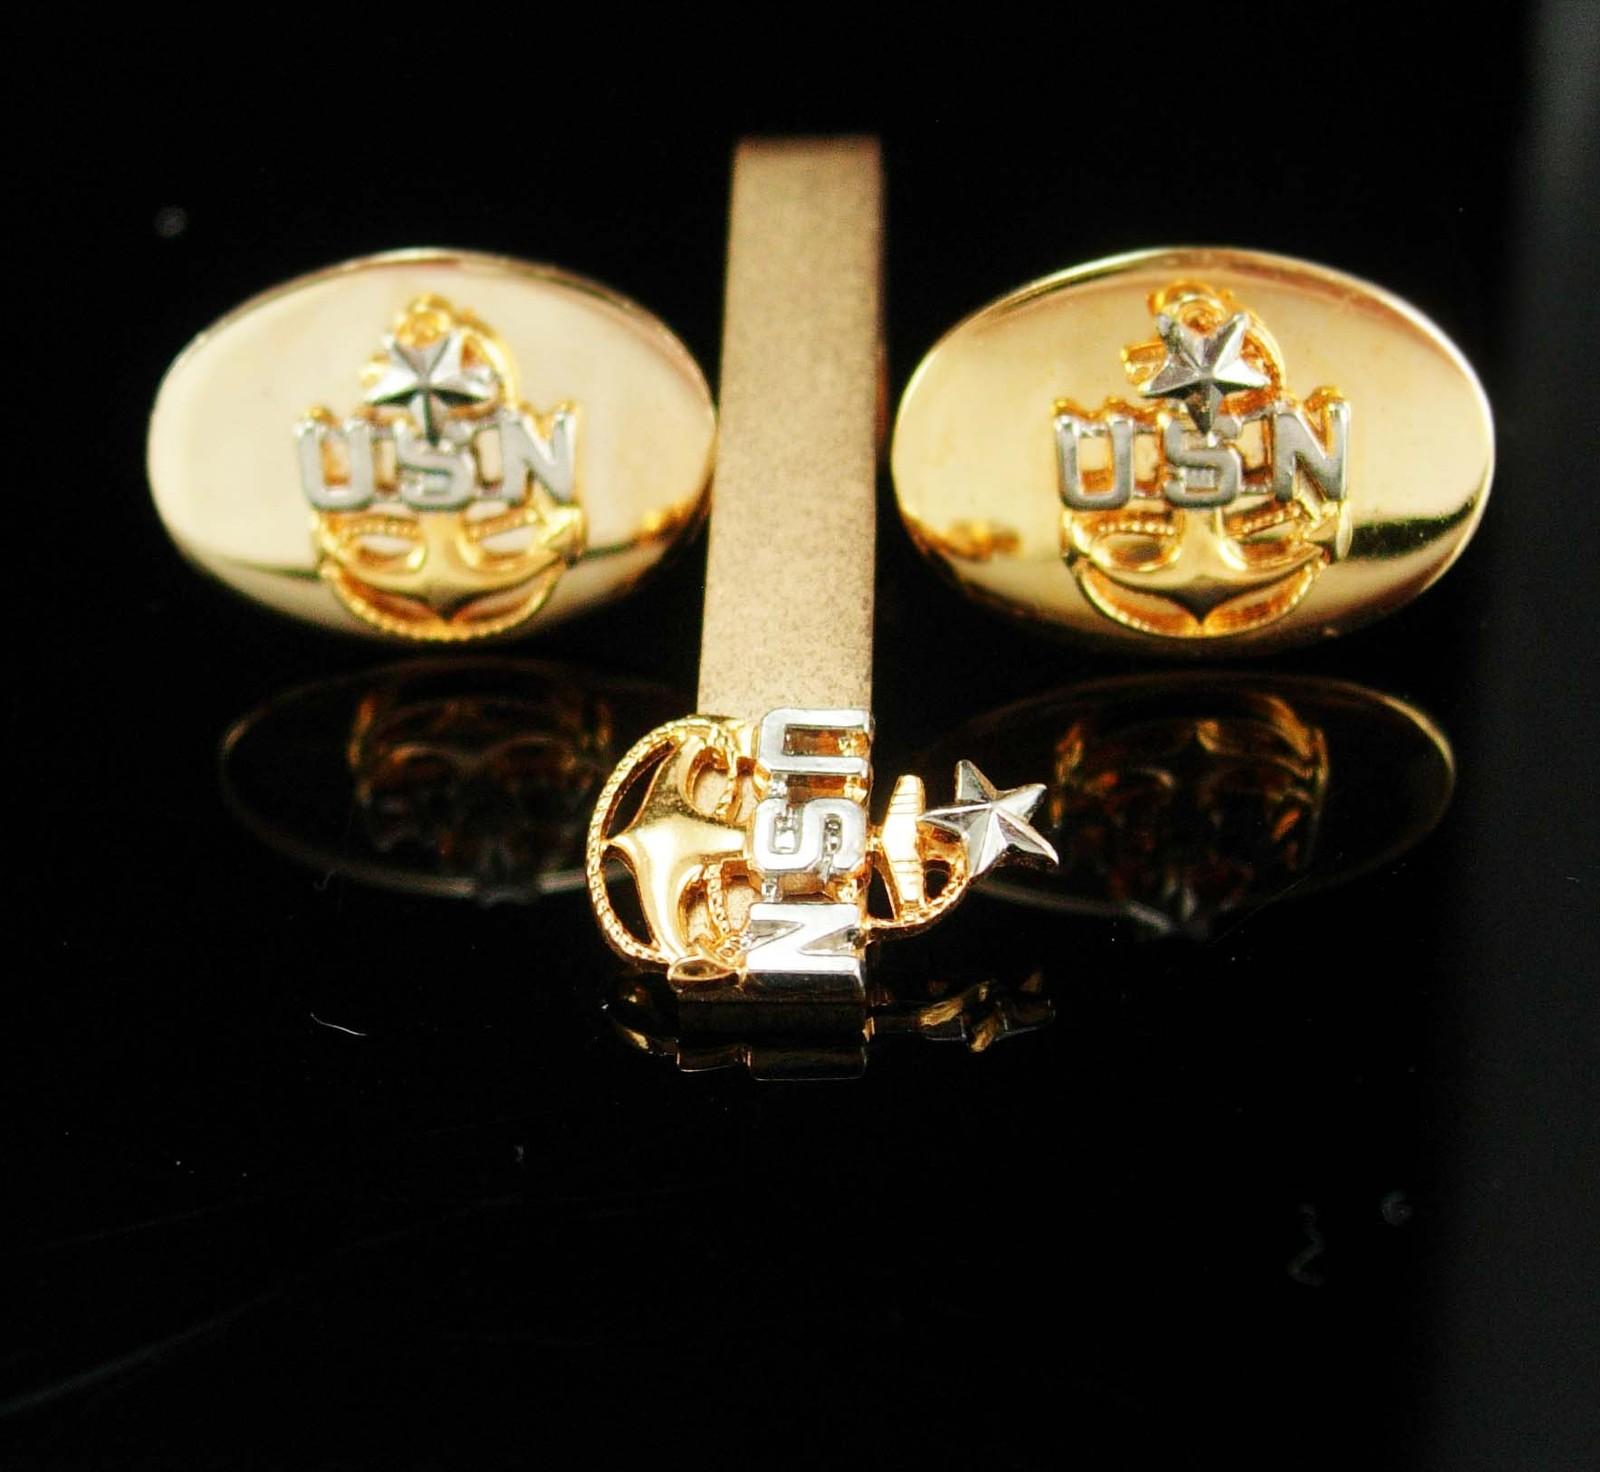 Navy Cuff links vintage gold naval officer Tie clip USN Cufflinks military insig